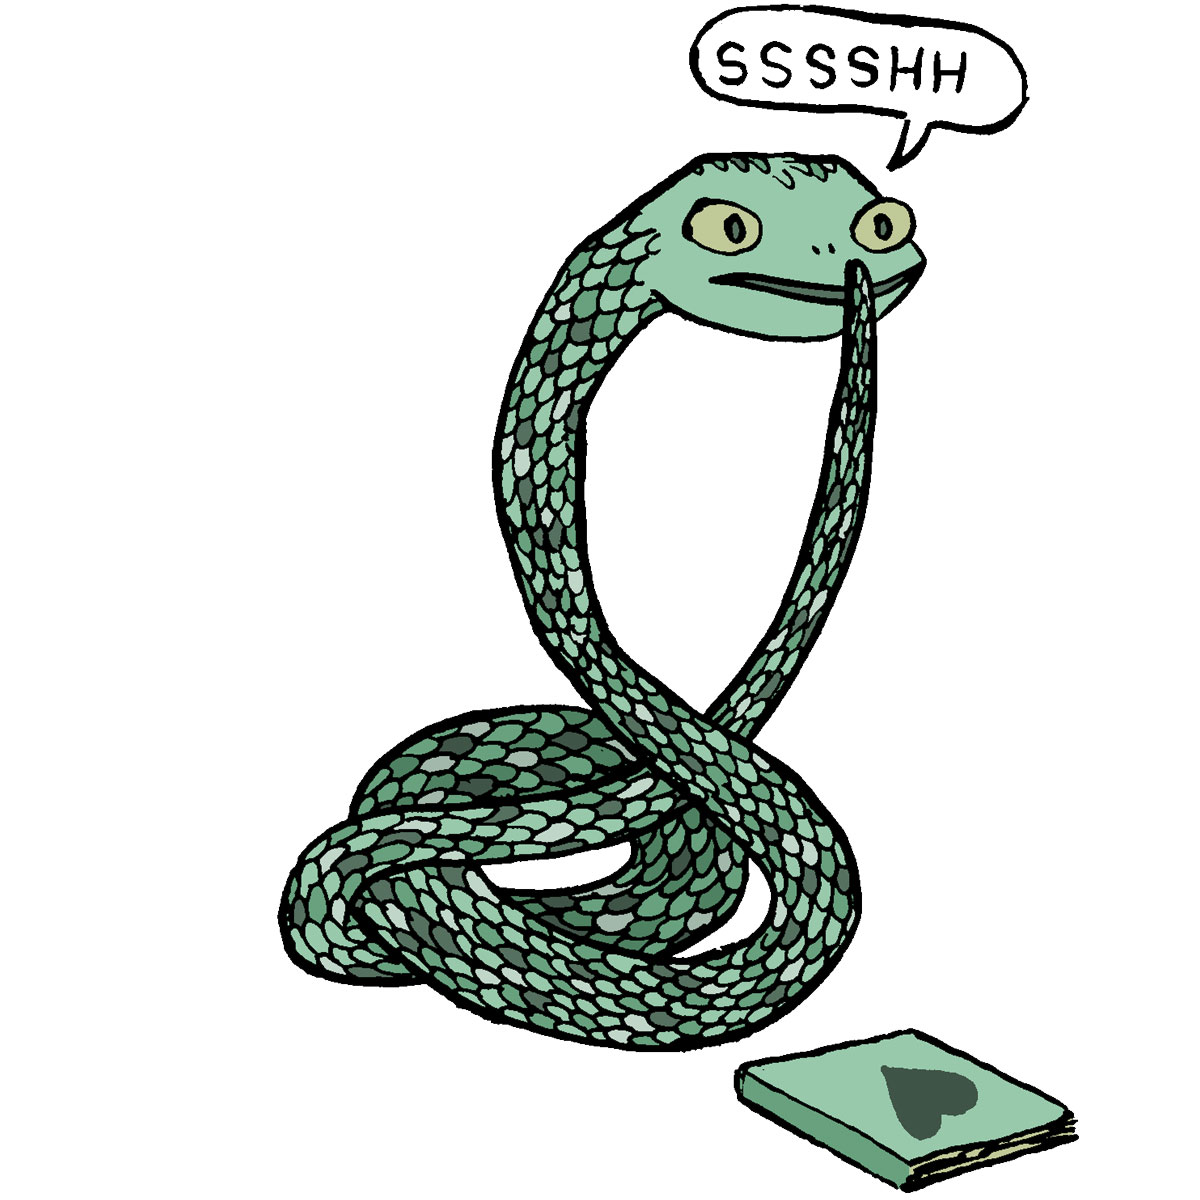 a snake librarian shushing you